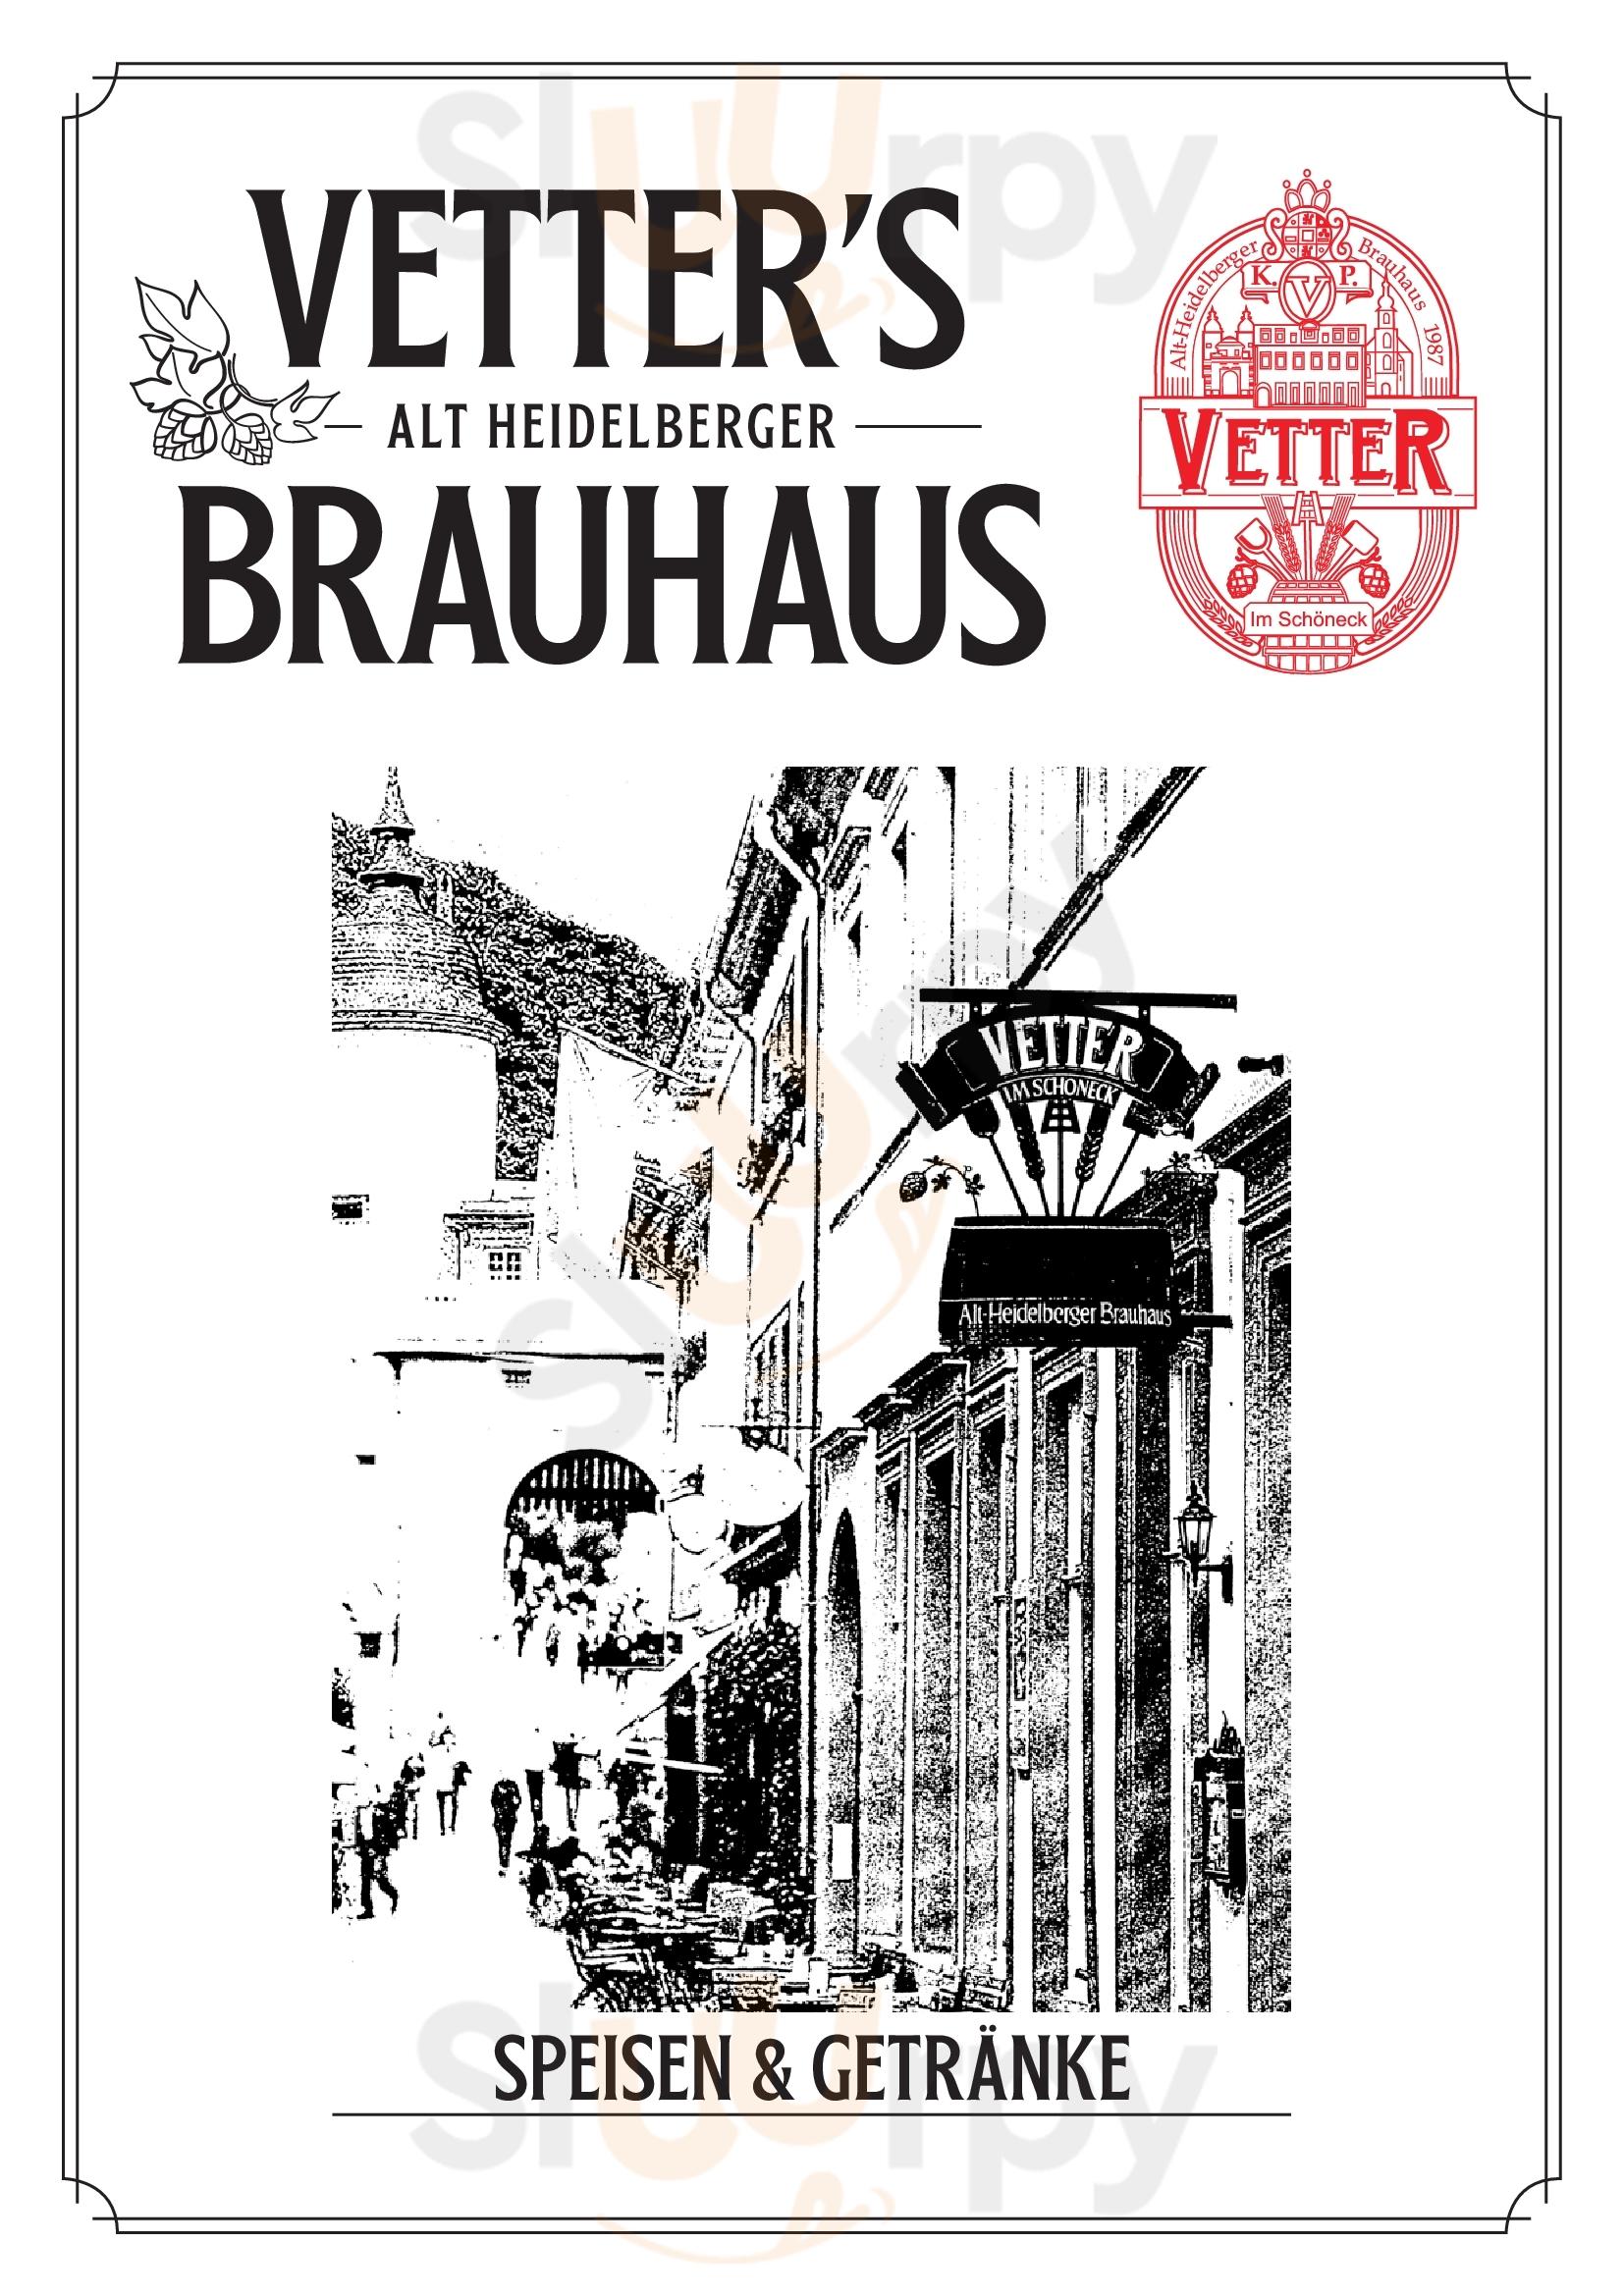 Vetter's Alt Heidelberger Brauhaus Heidelberg Menu - 1